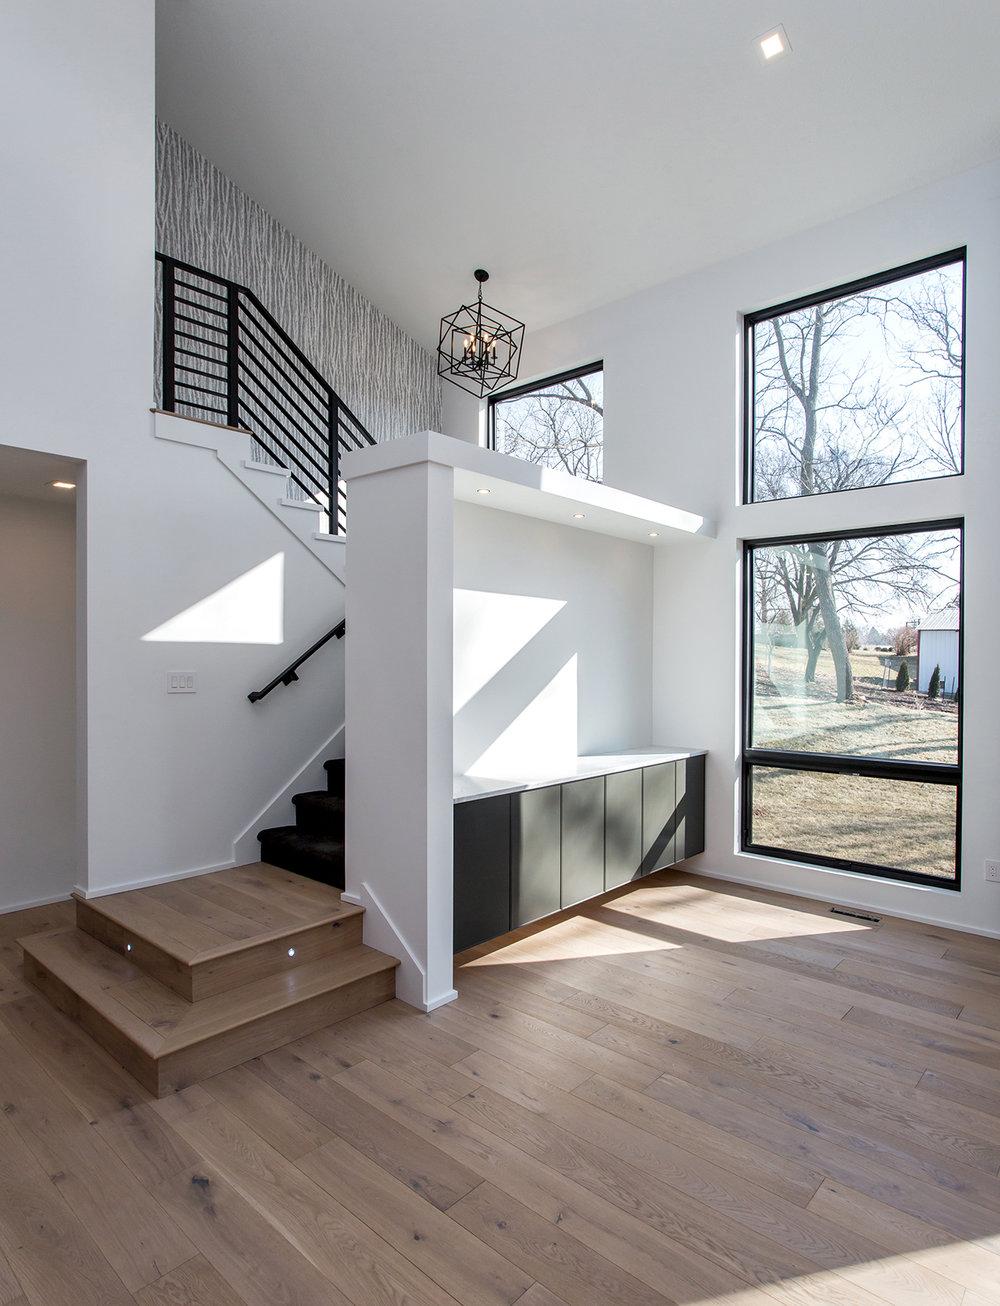 dreamscape-homebuilders_26907358028_o.jpg